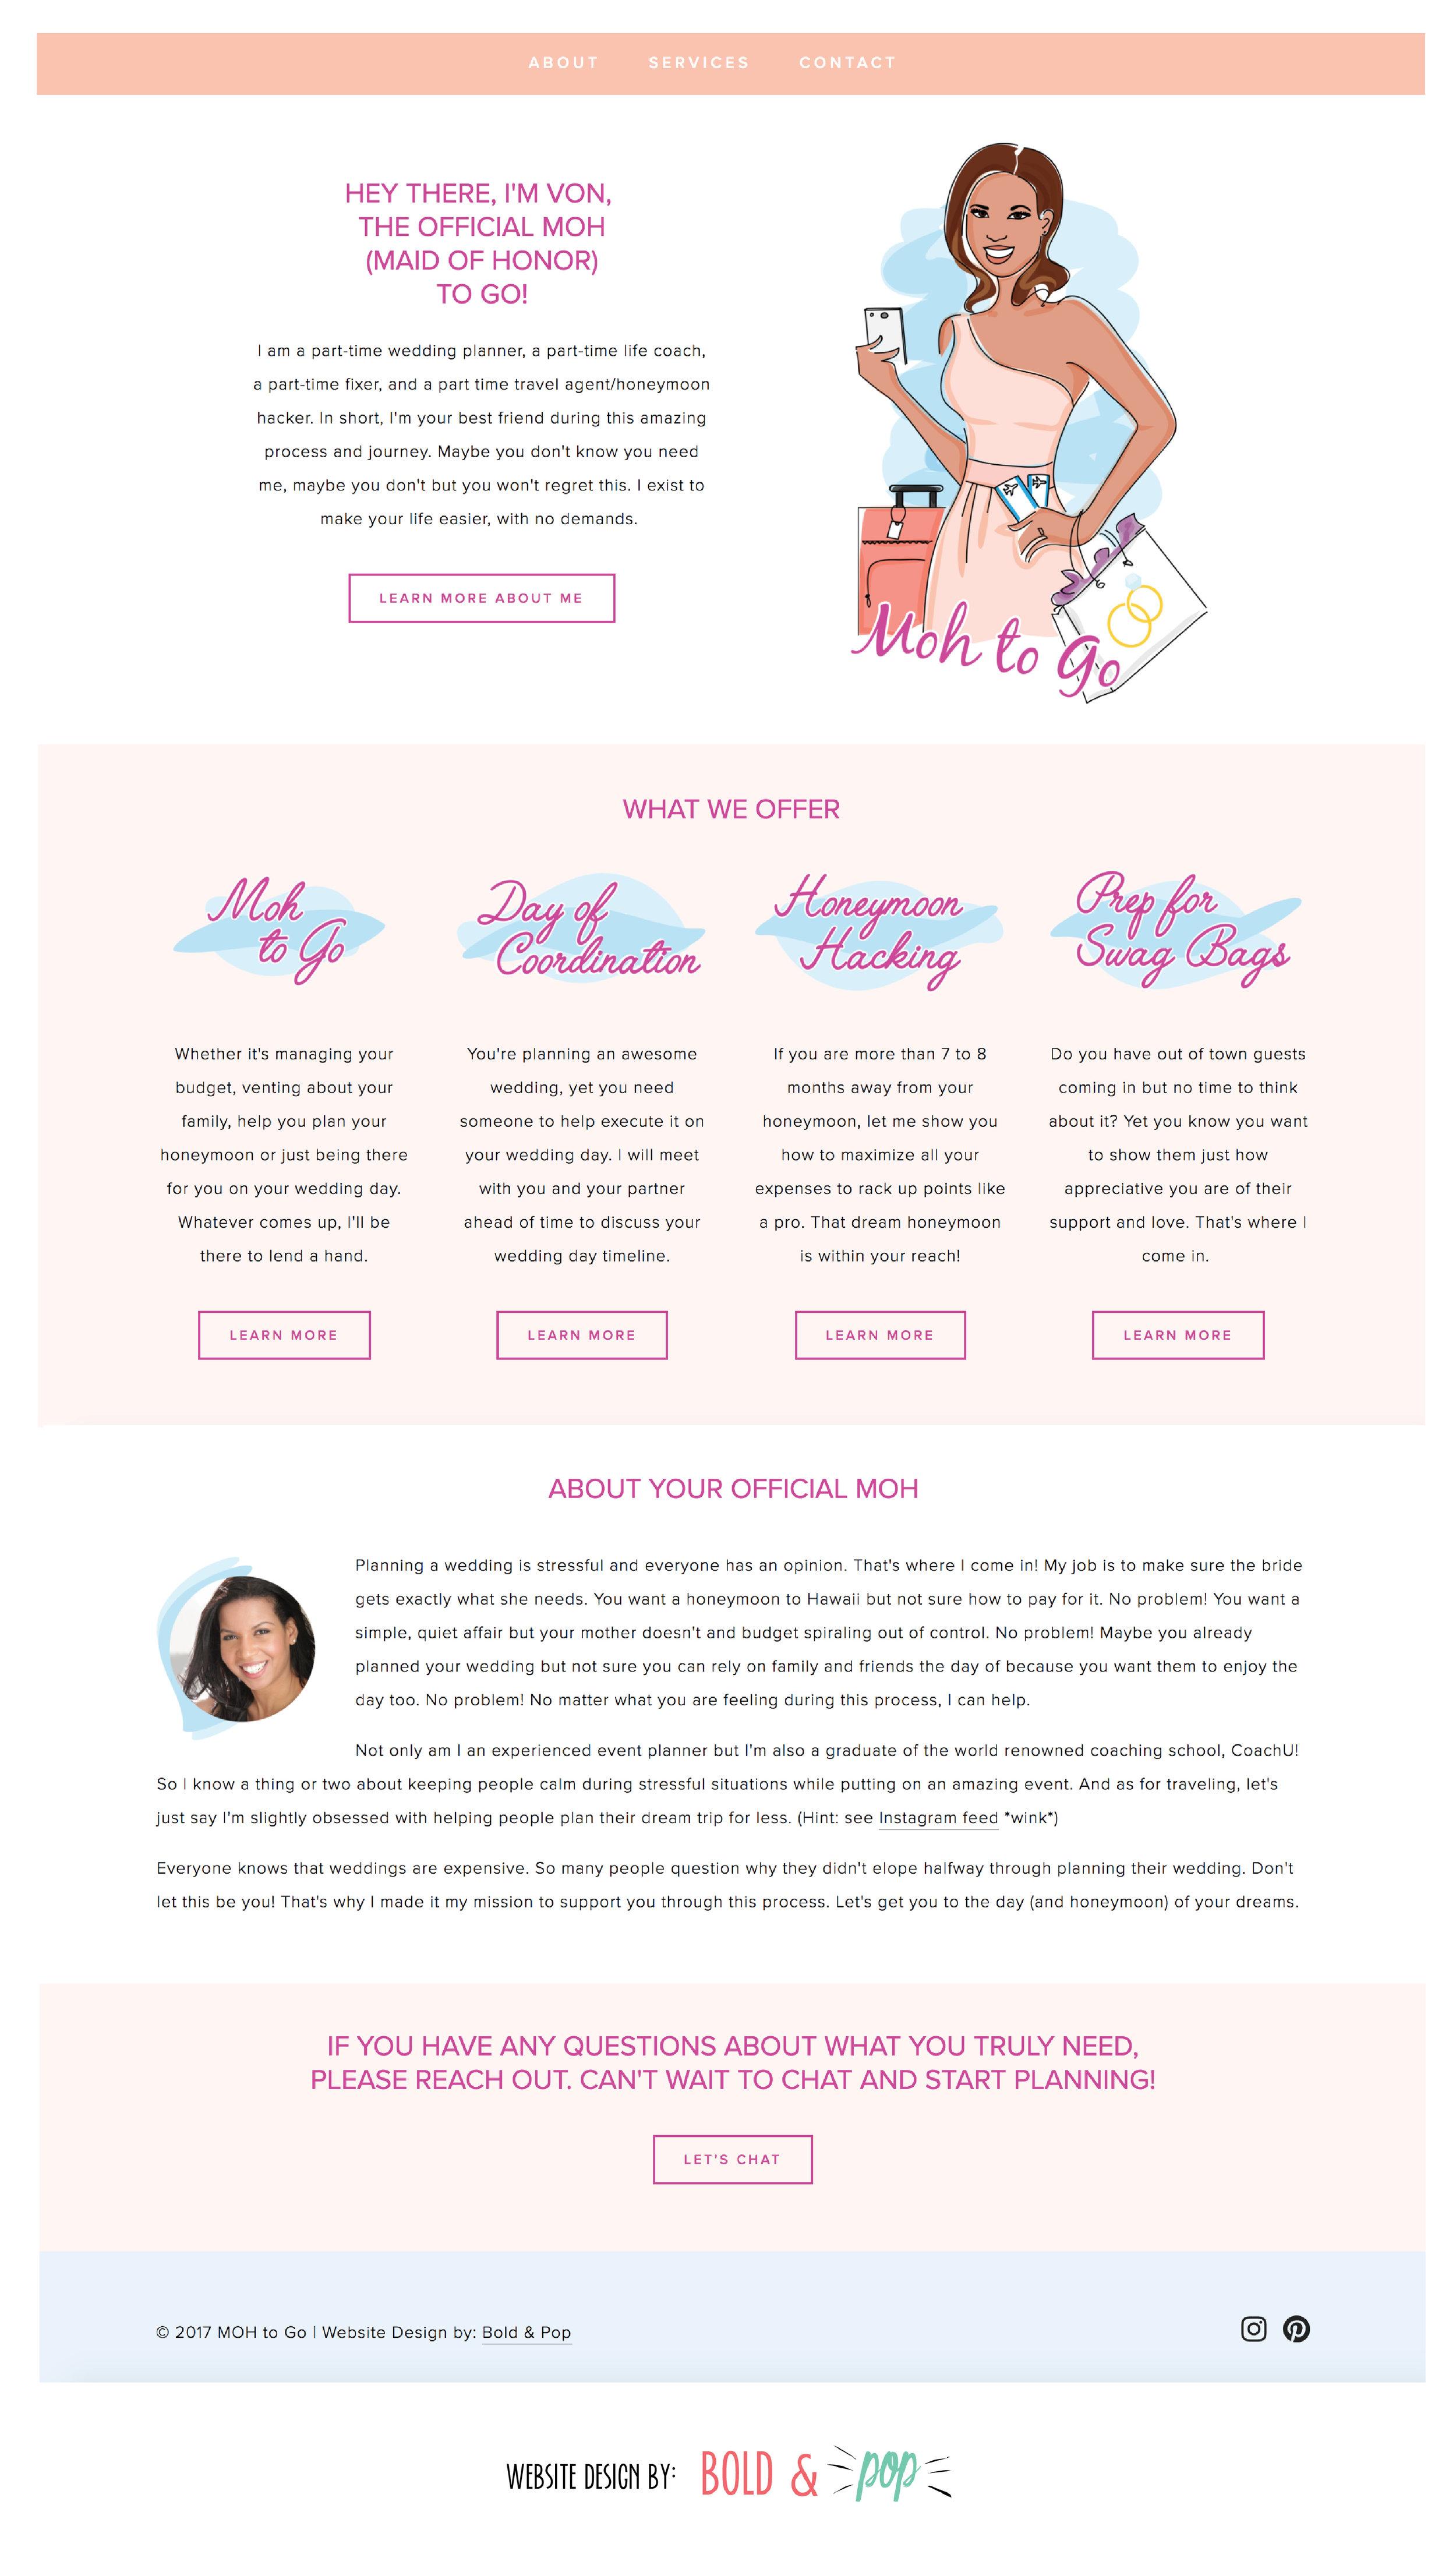 Bold & Pop : MOH to Go Squarespace Website Design Project